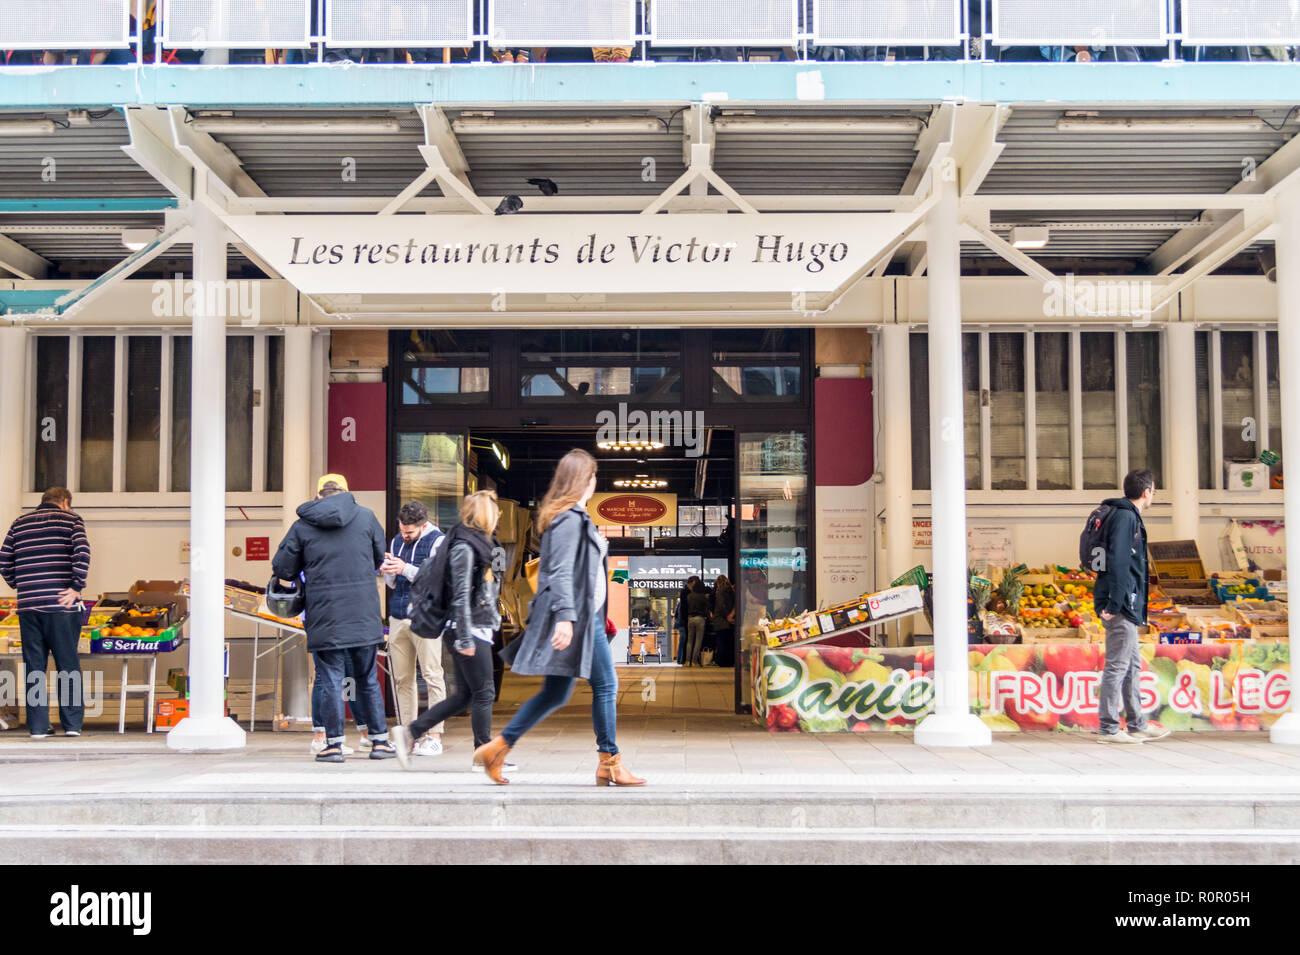 Exterior of Marché Victor Hugo, French market, 1959, by Lafitte & Génard, Toulouse, Haute-Garonne, Occitanie, France Stock Photo